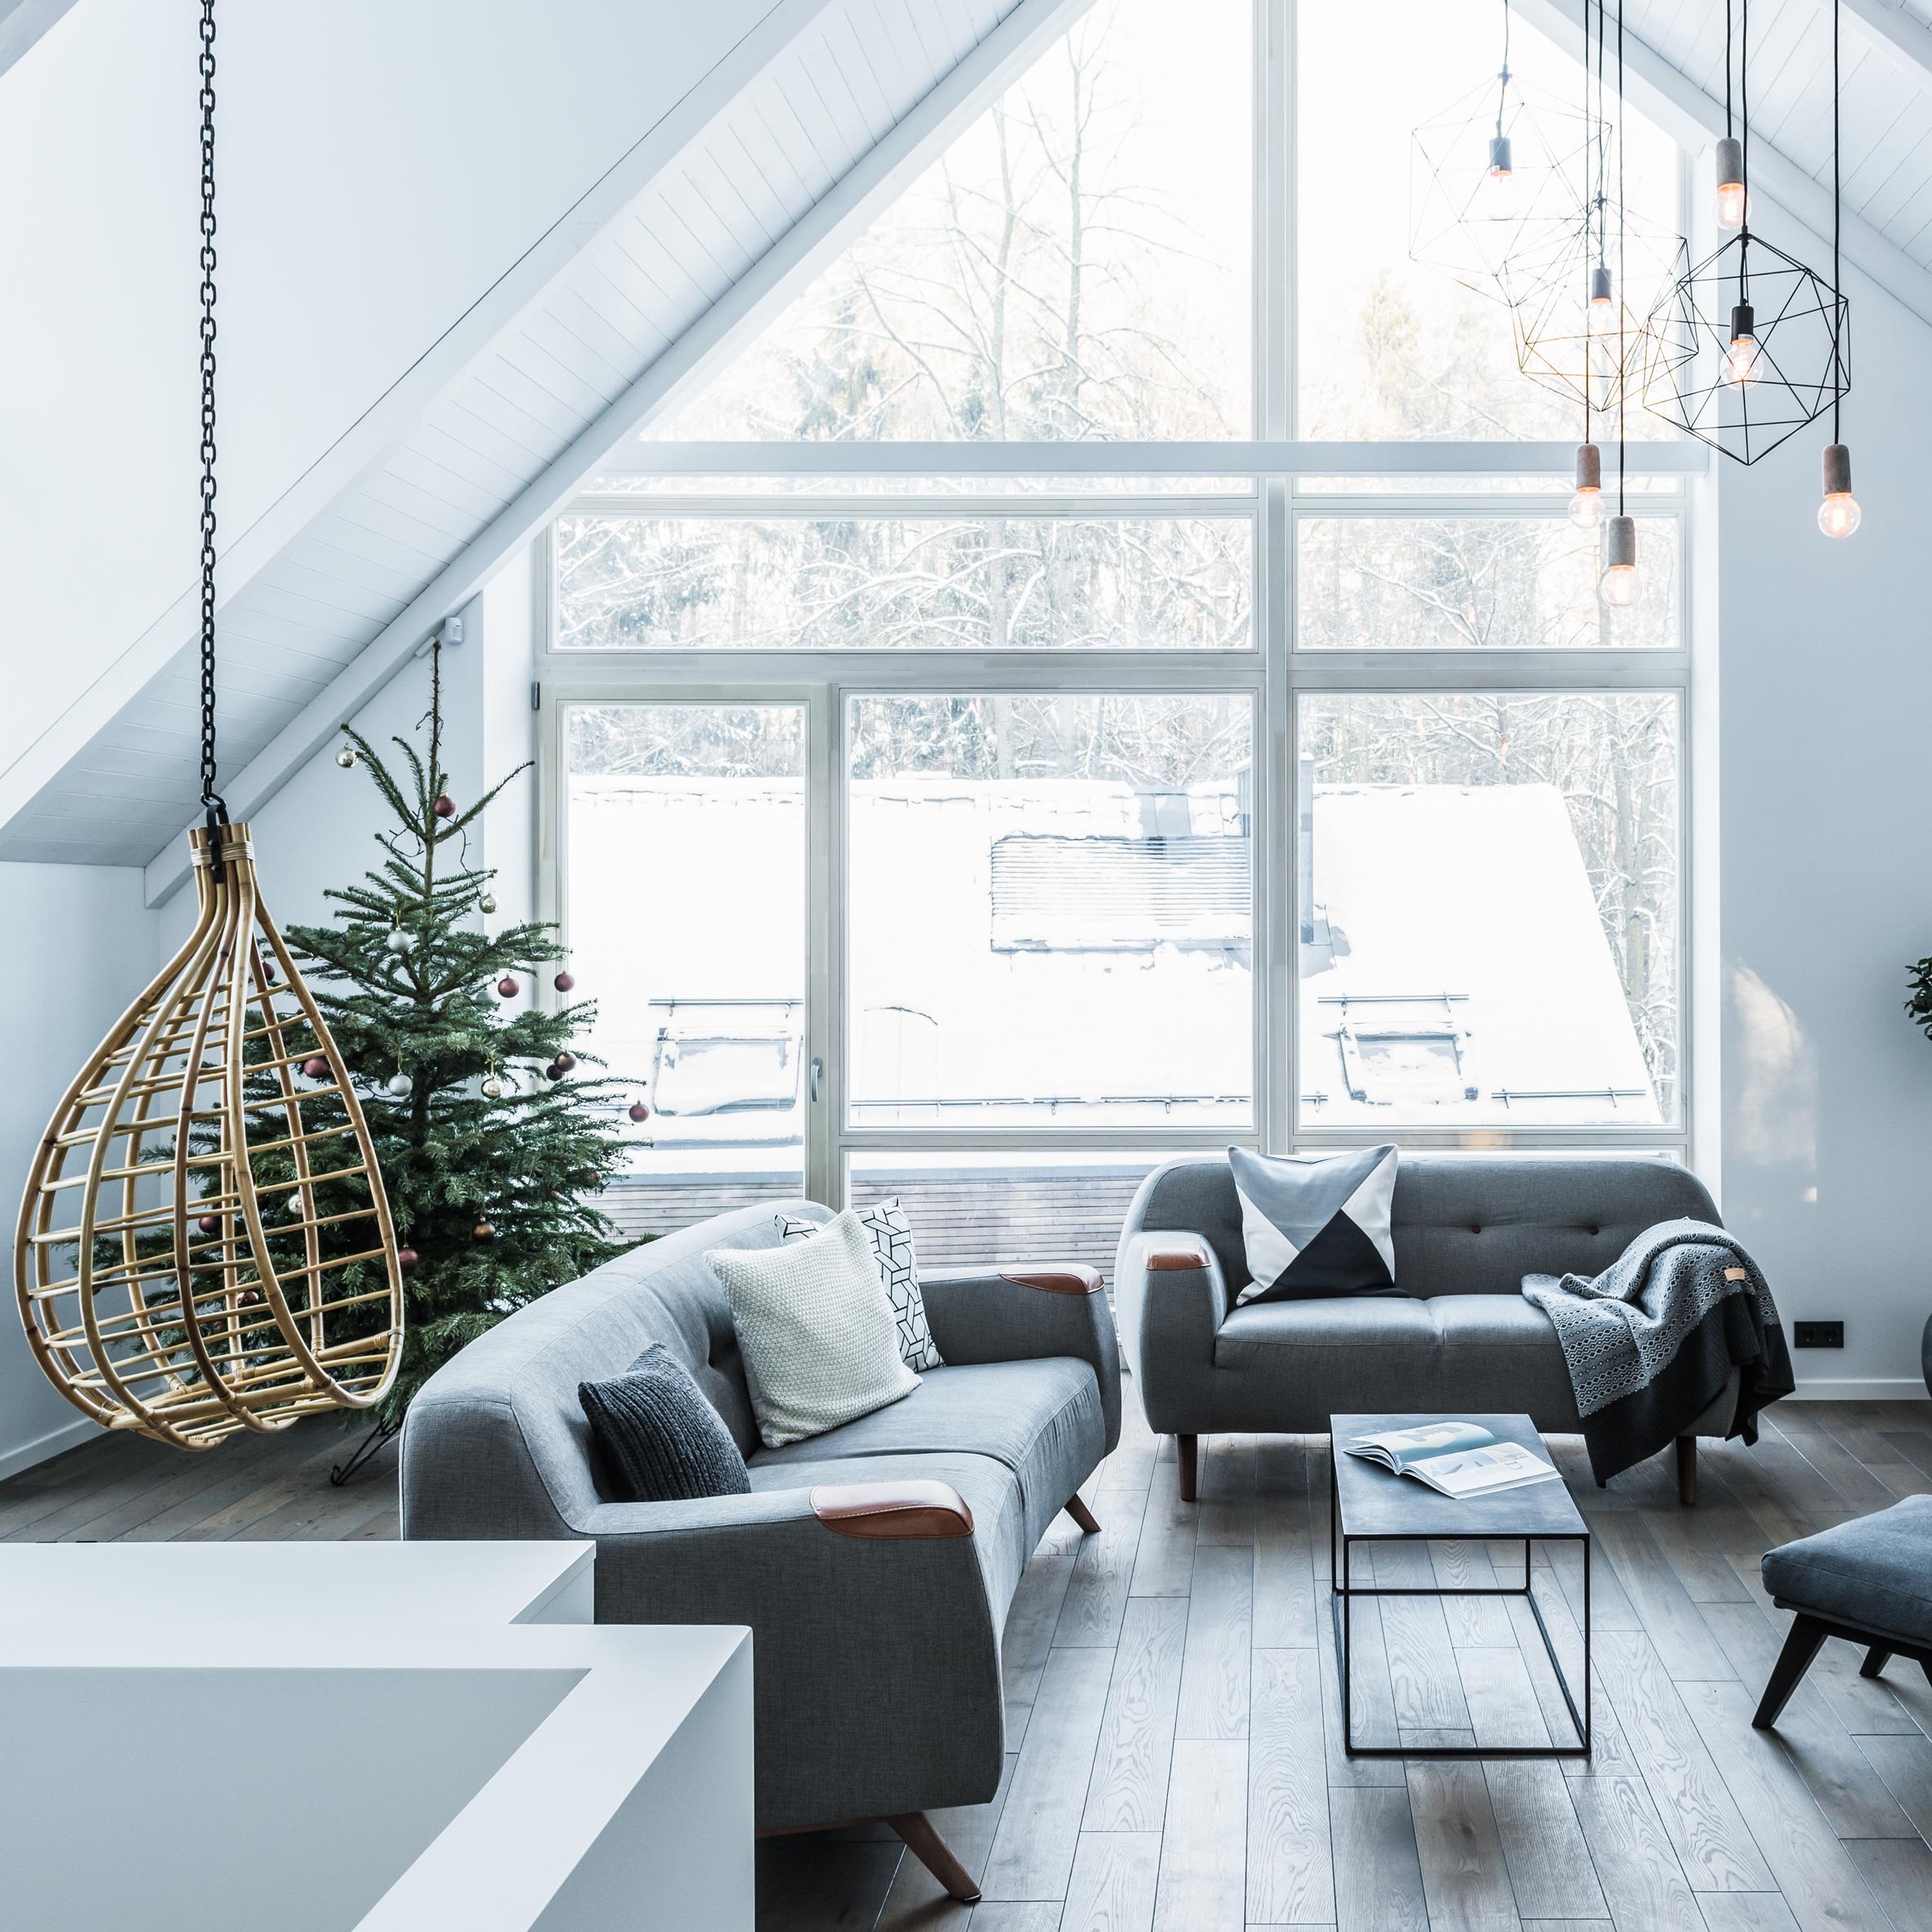 House on Stilts by Dizaino Virtuv